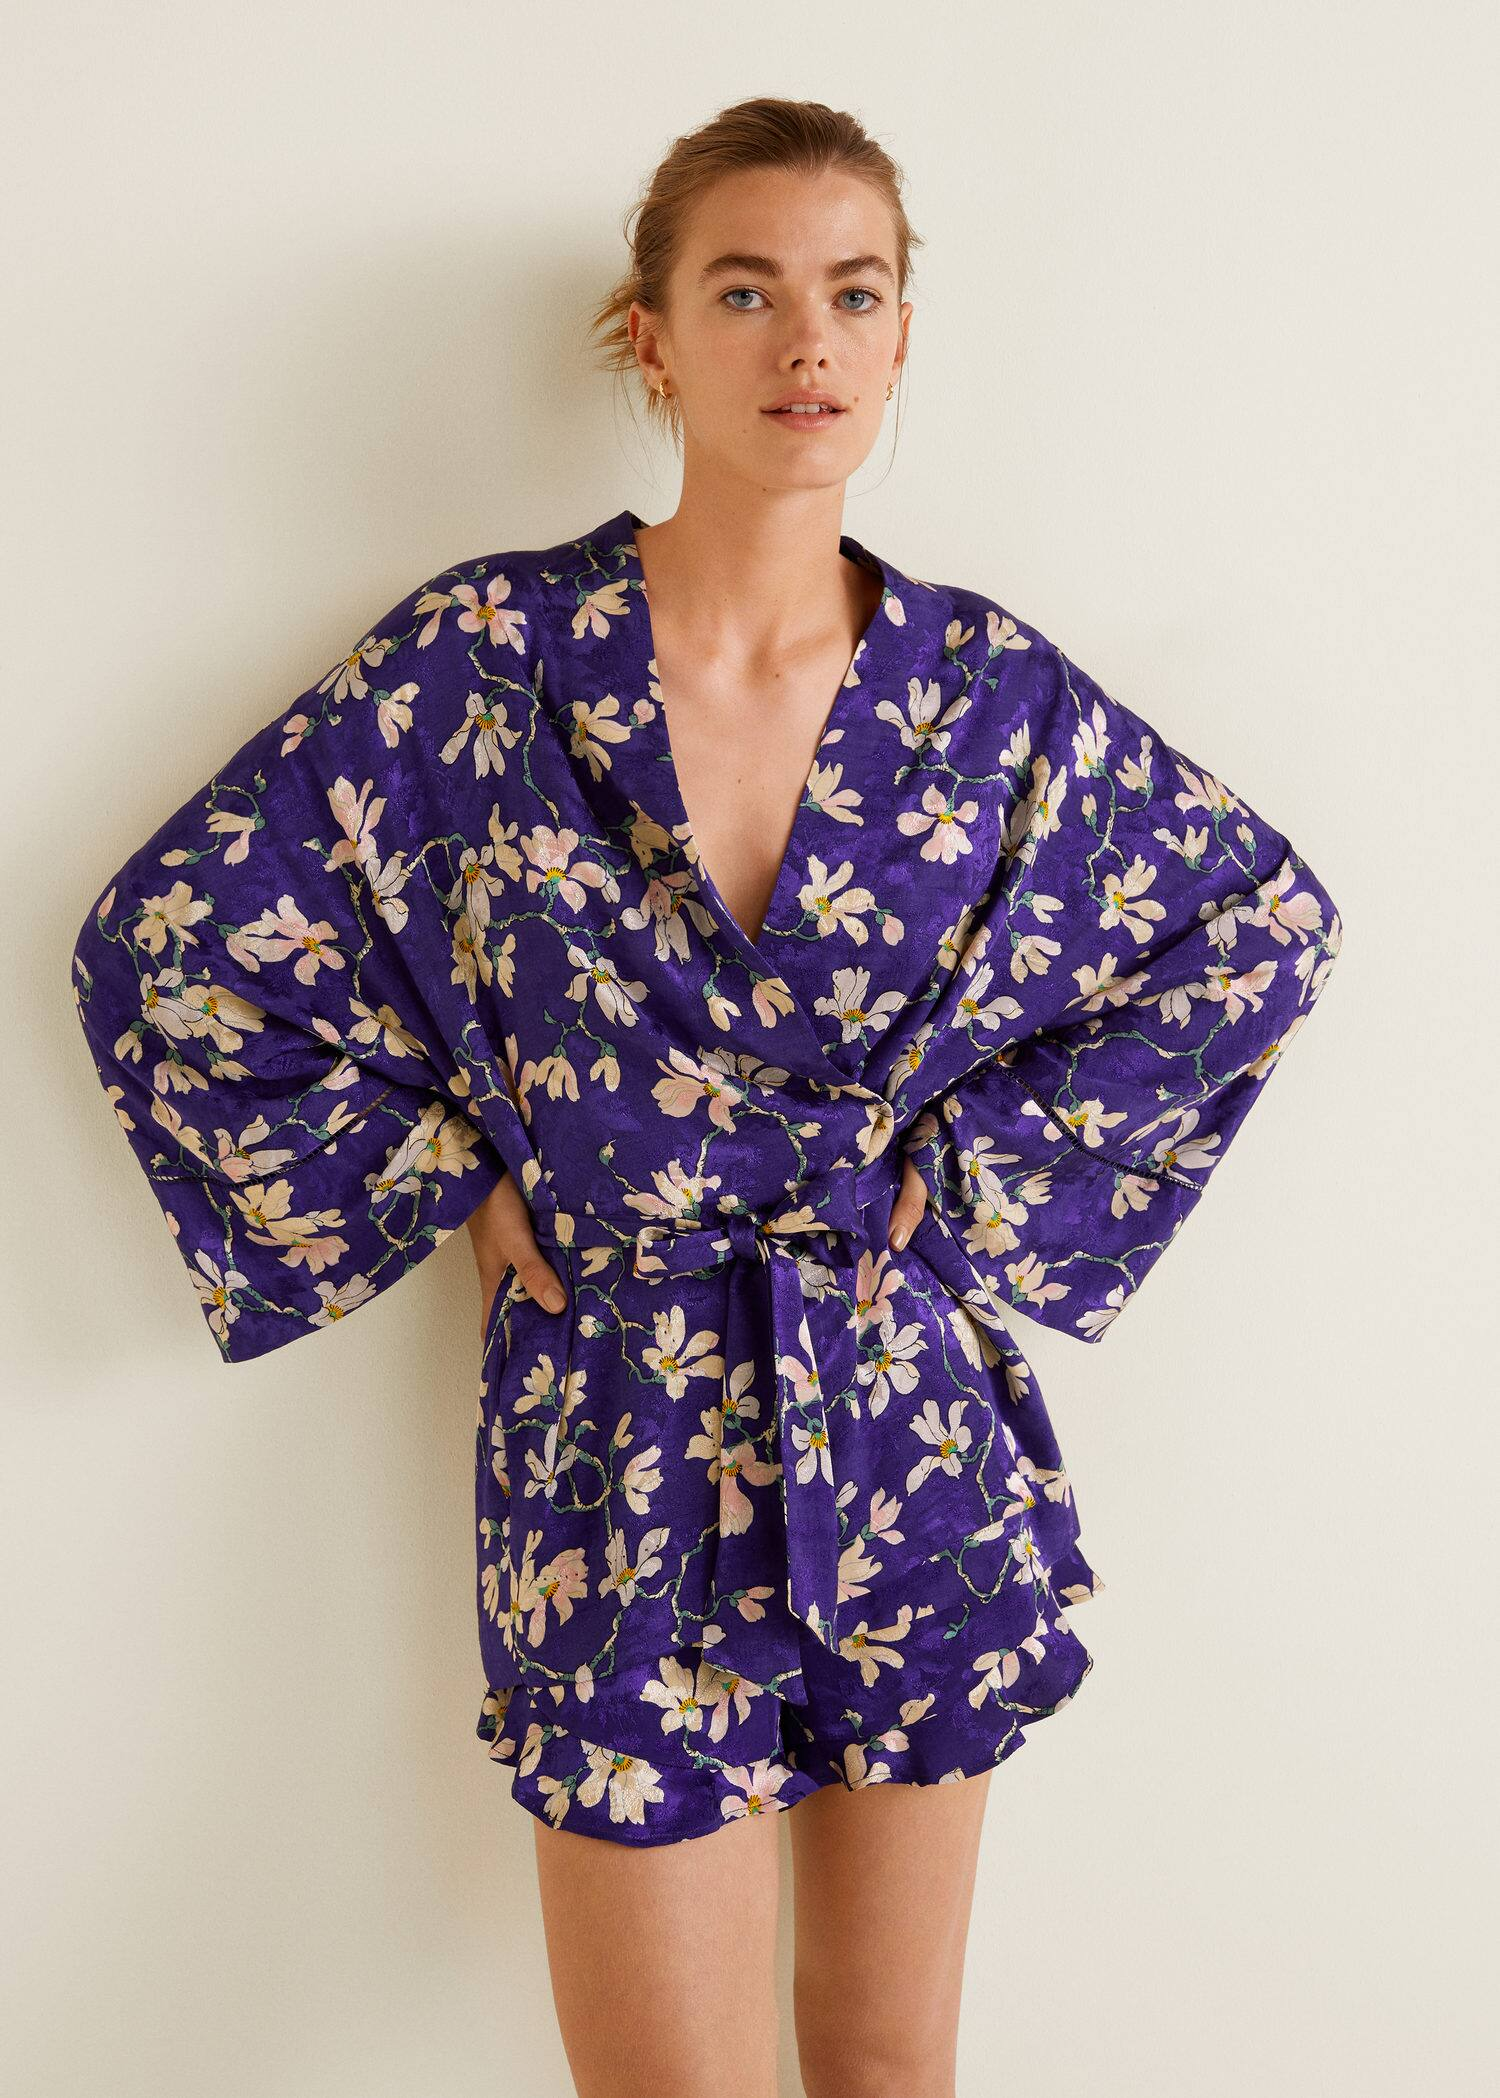 nouveaux styles Achat/Vente attrayant et durable Kimono med blomstertrykk - Damer | OUTLET Norge